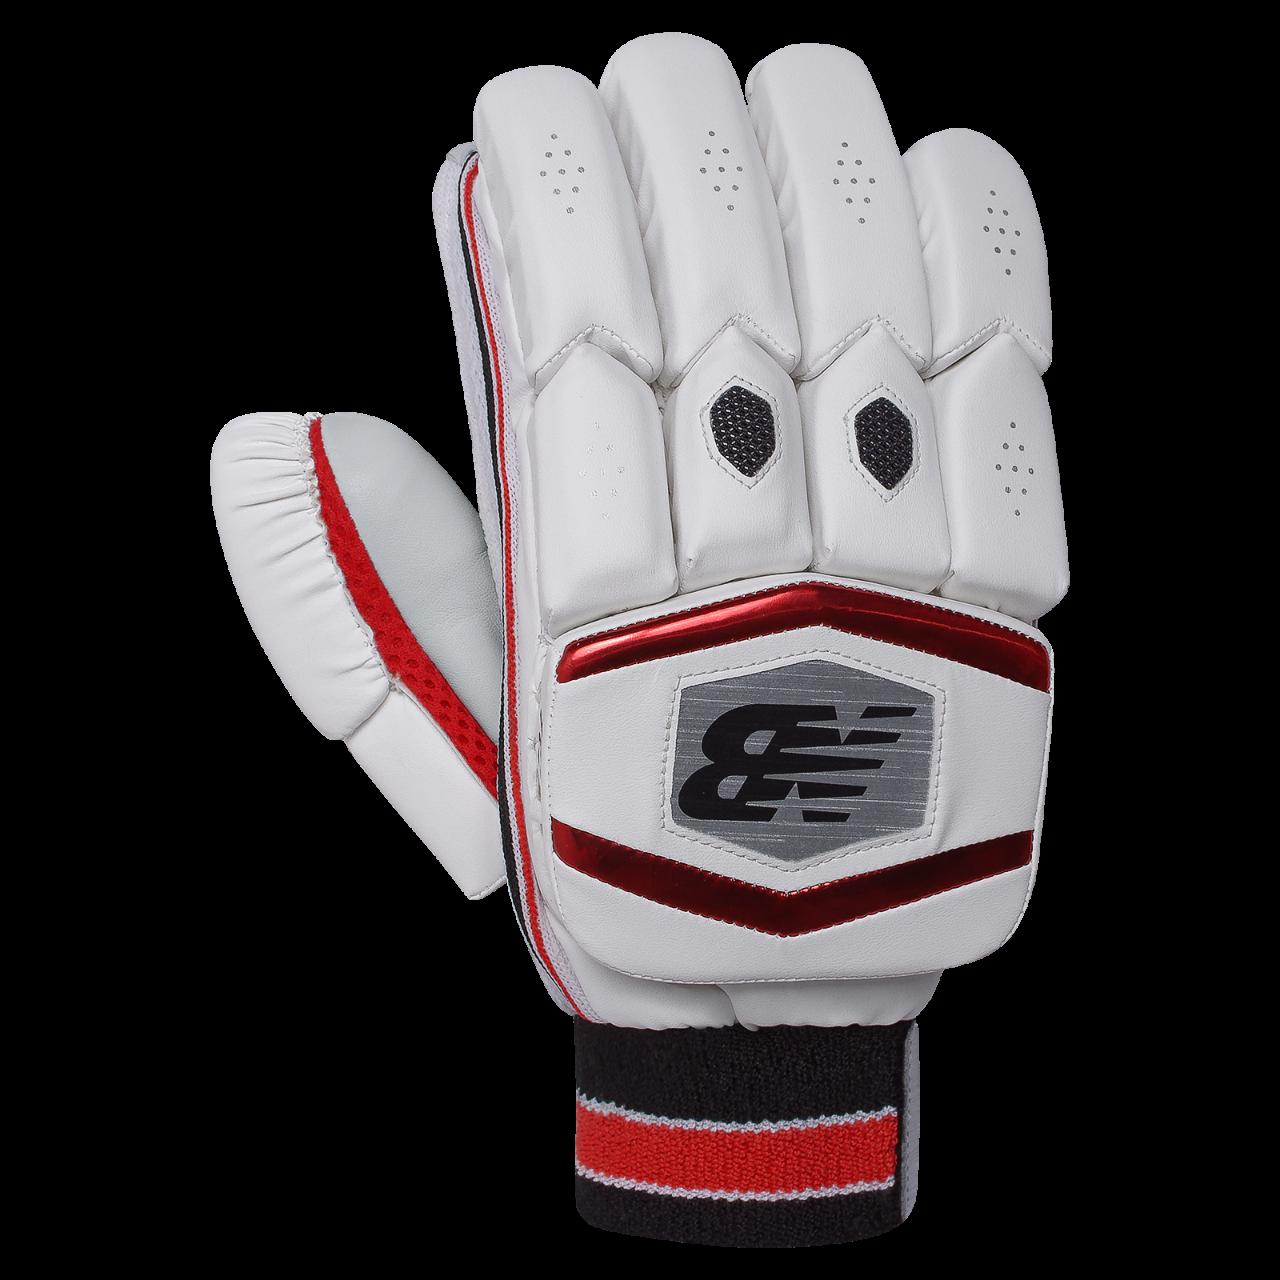 2020 New Balance TC 560 Junior Batting Gloves